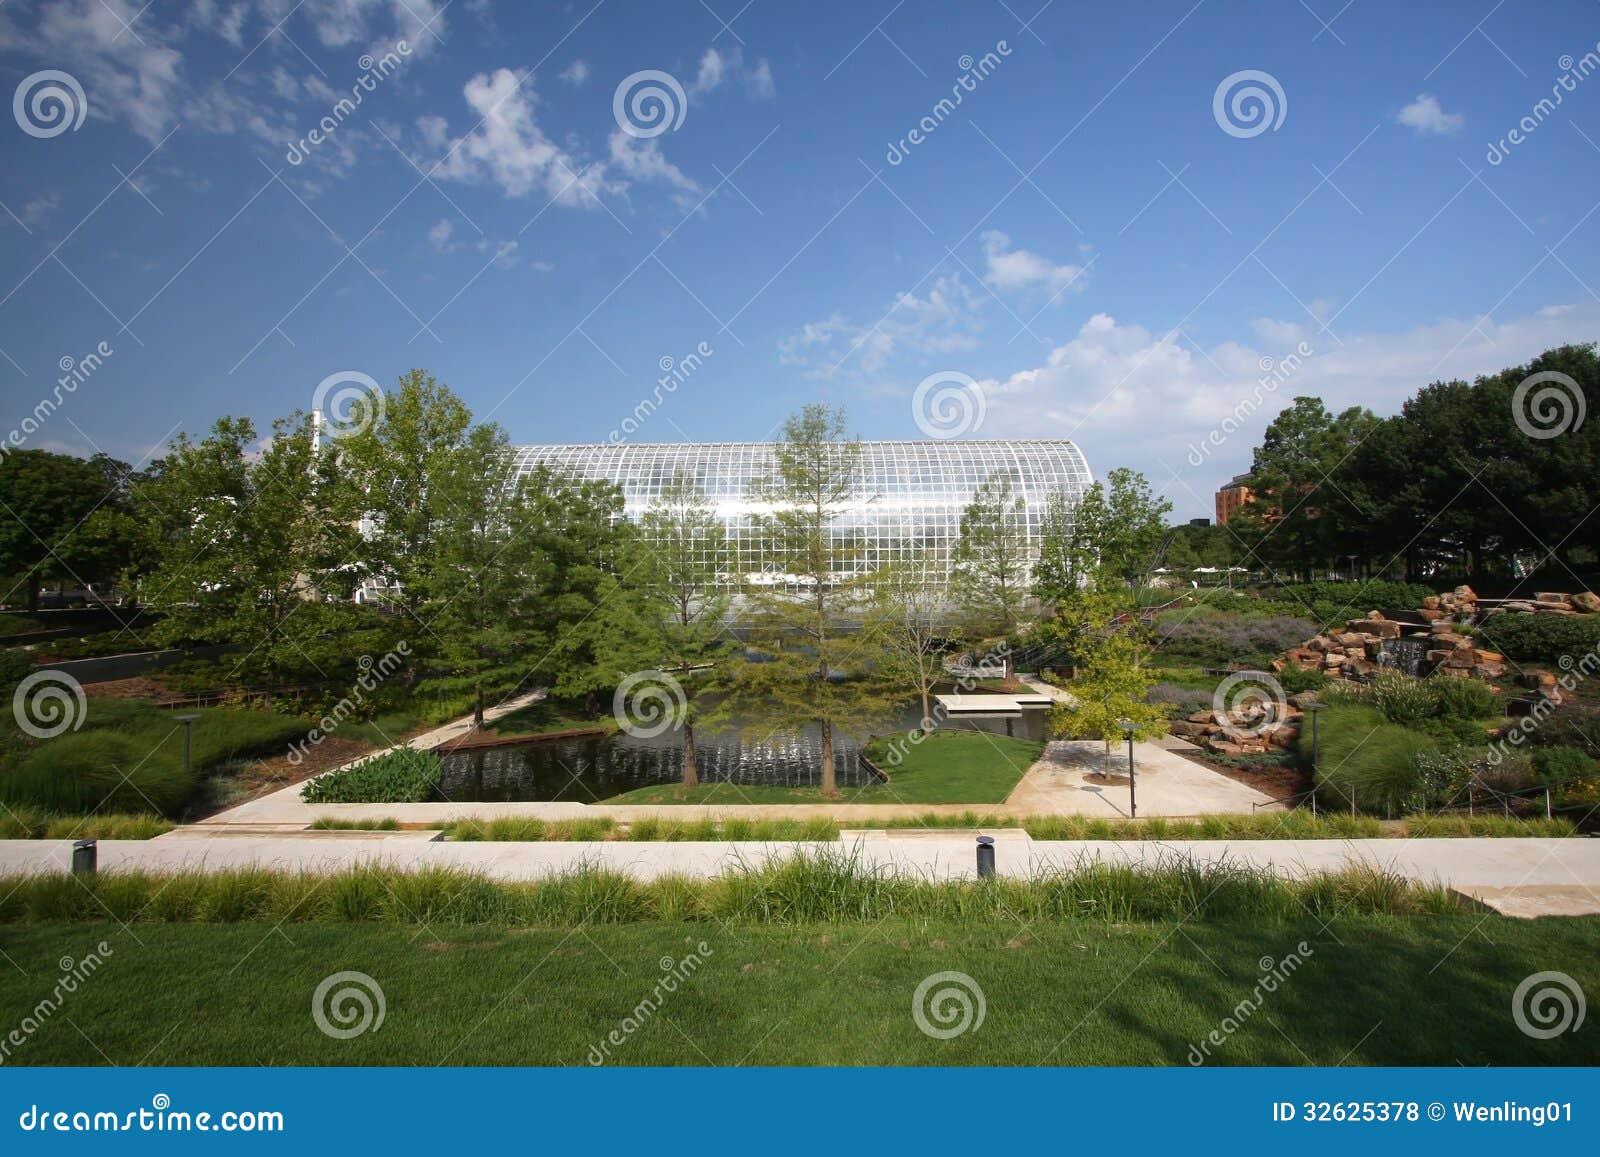 The Myriad Botanical Gardens Royalty Free Stock Photos Image 32625378